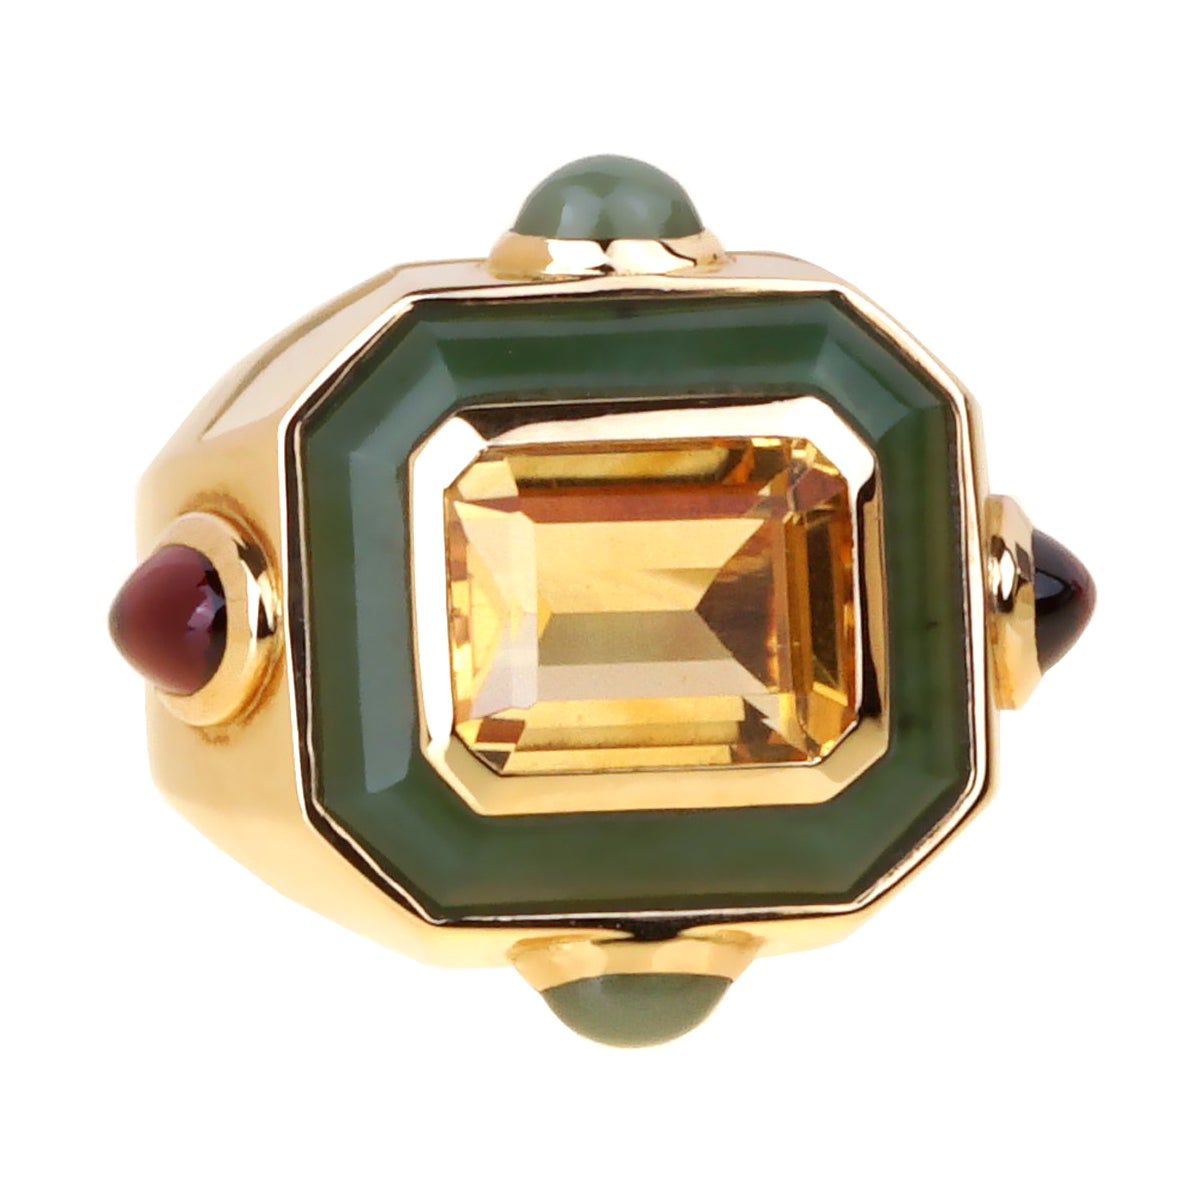 Chanel Paris Citrine Jade Gold Cocktail Ring